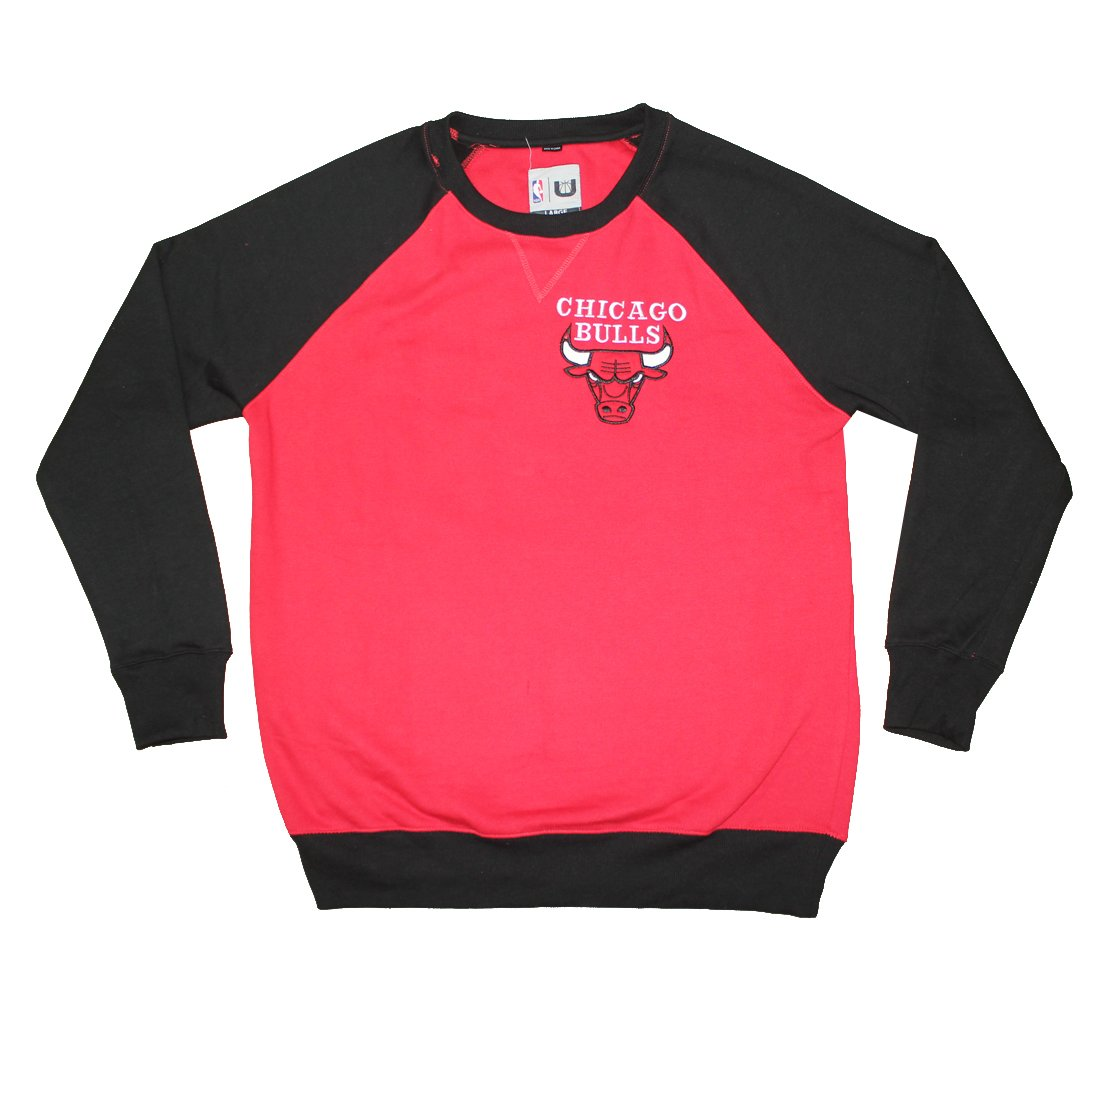 BIG & TALL NBA Mens CHICAGO BULLS: Athletic Pullover Sweatshirt 2XL Multicolor